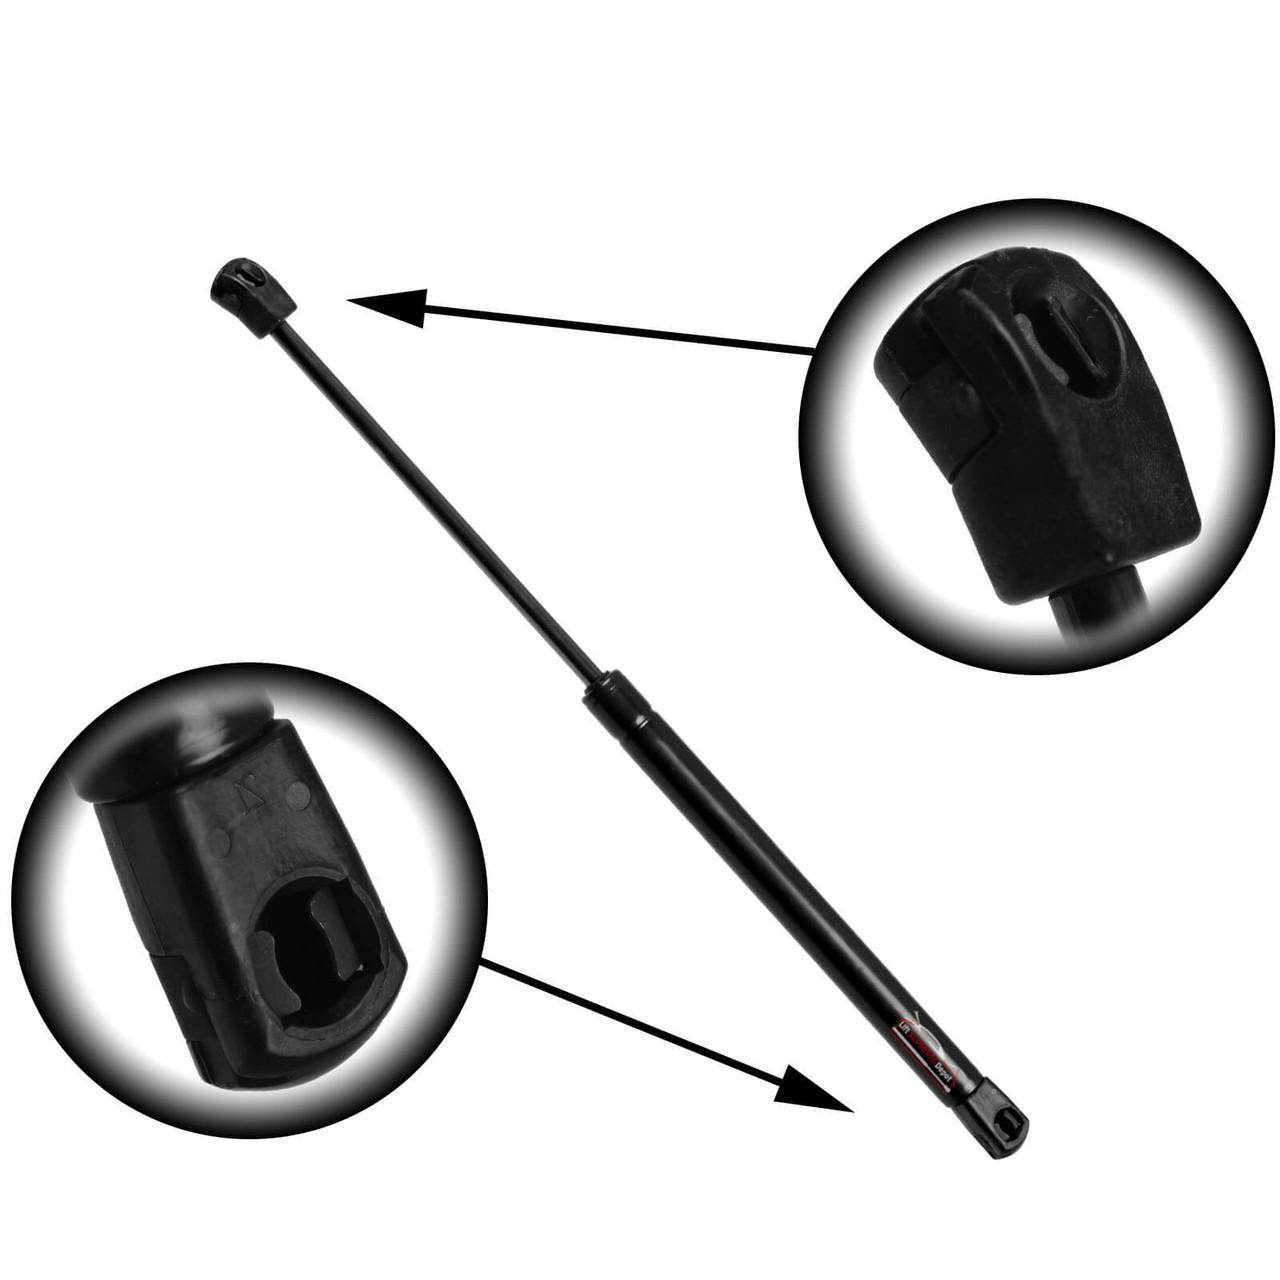 StrongArm 6765 Hood Lift Support